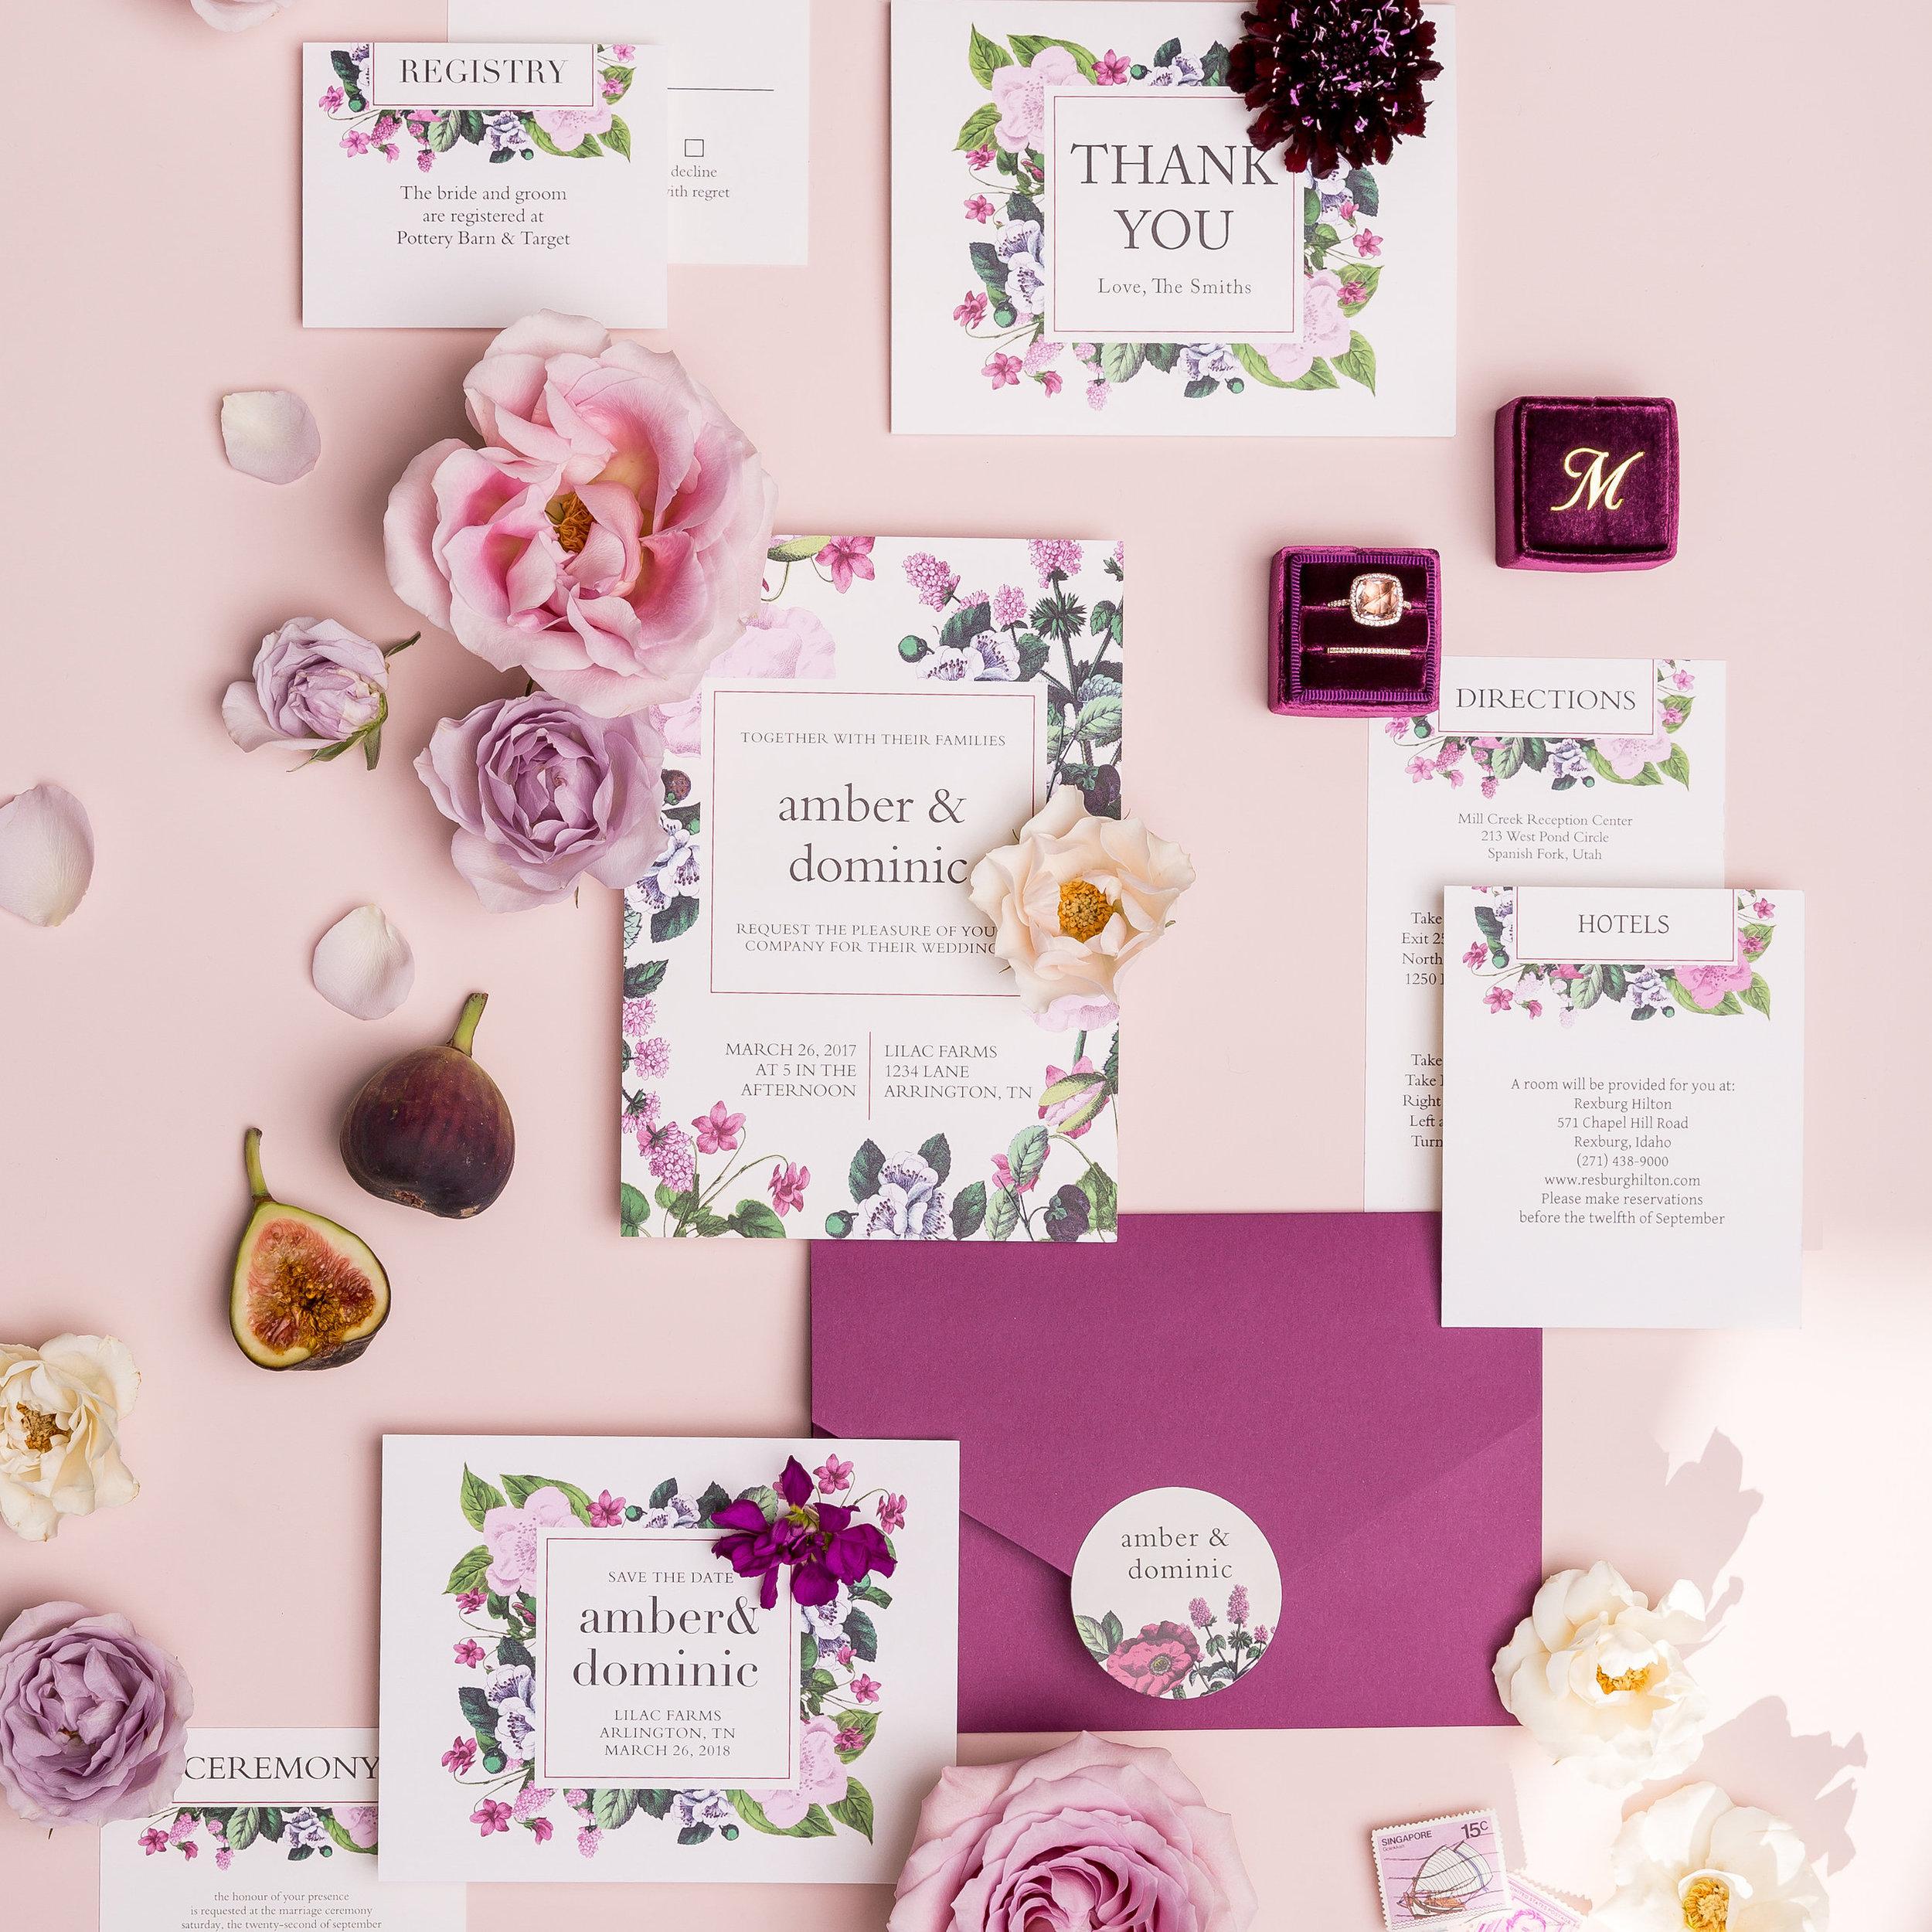 Basic_Invite_Spring_Wedding_22.jpg